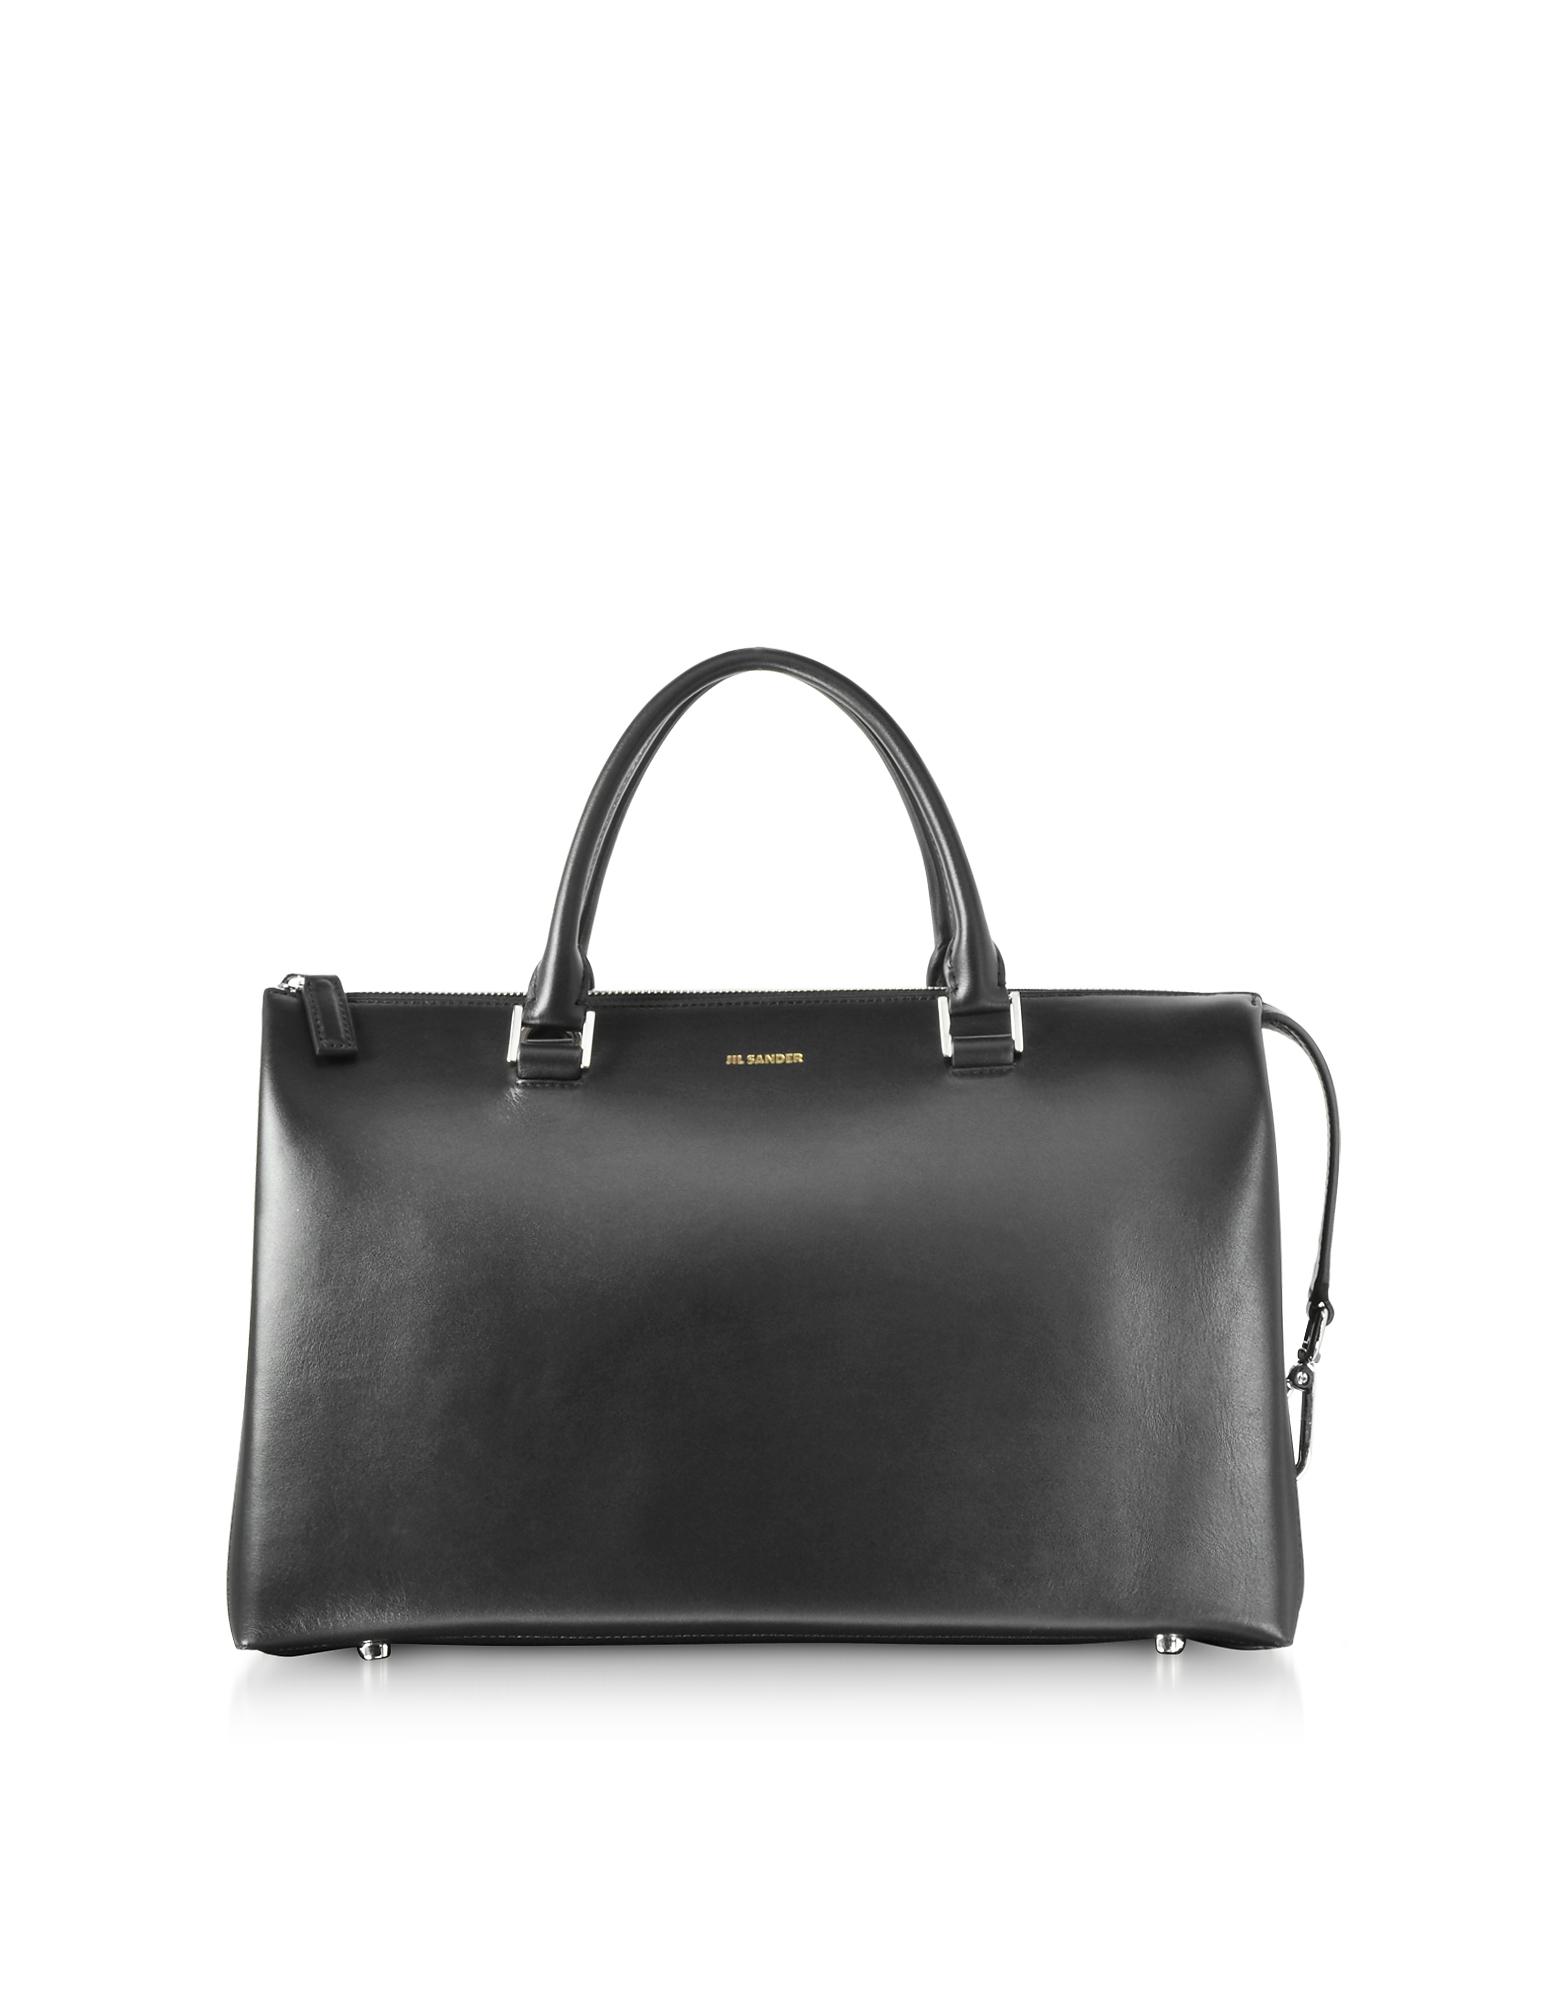 Jil Sander Handbags, Open Miscellaneous Leather Satchel Bag